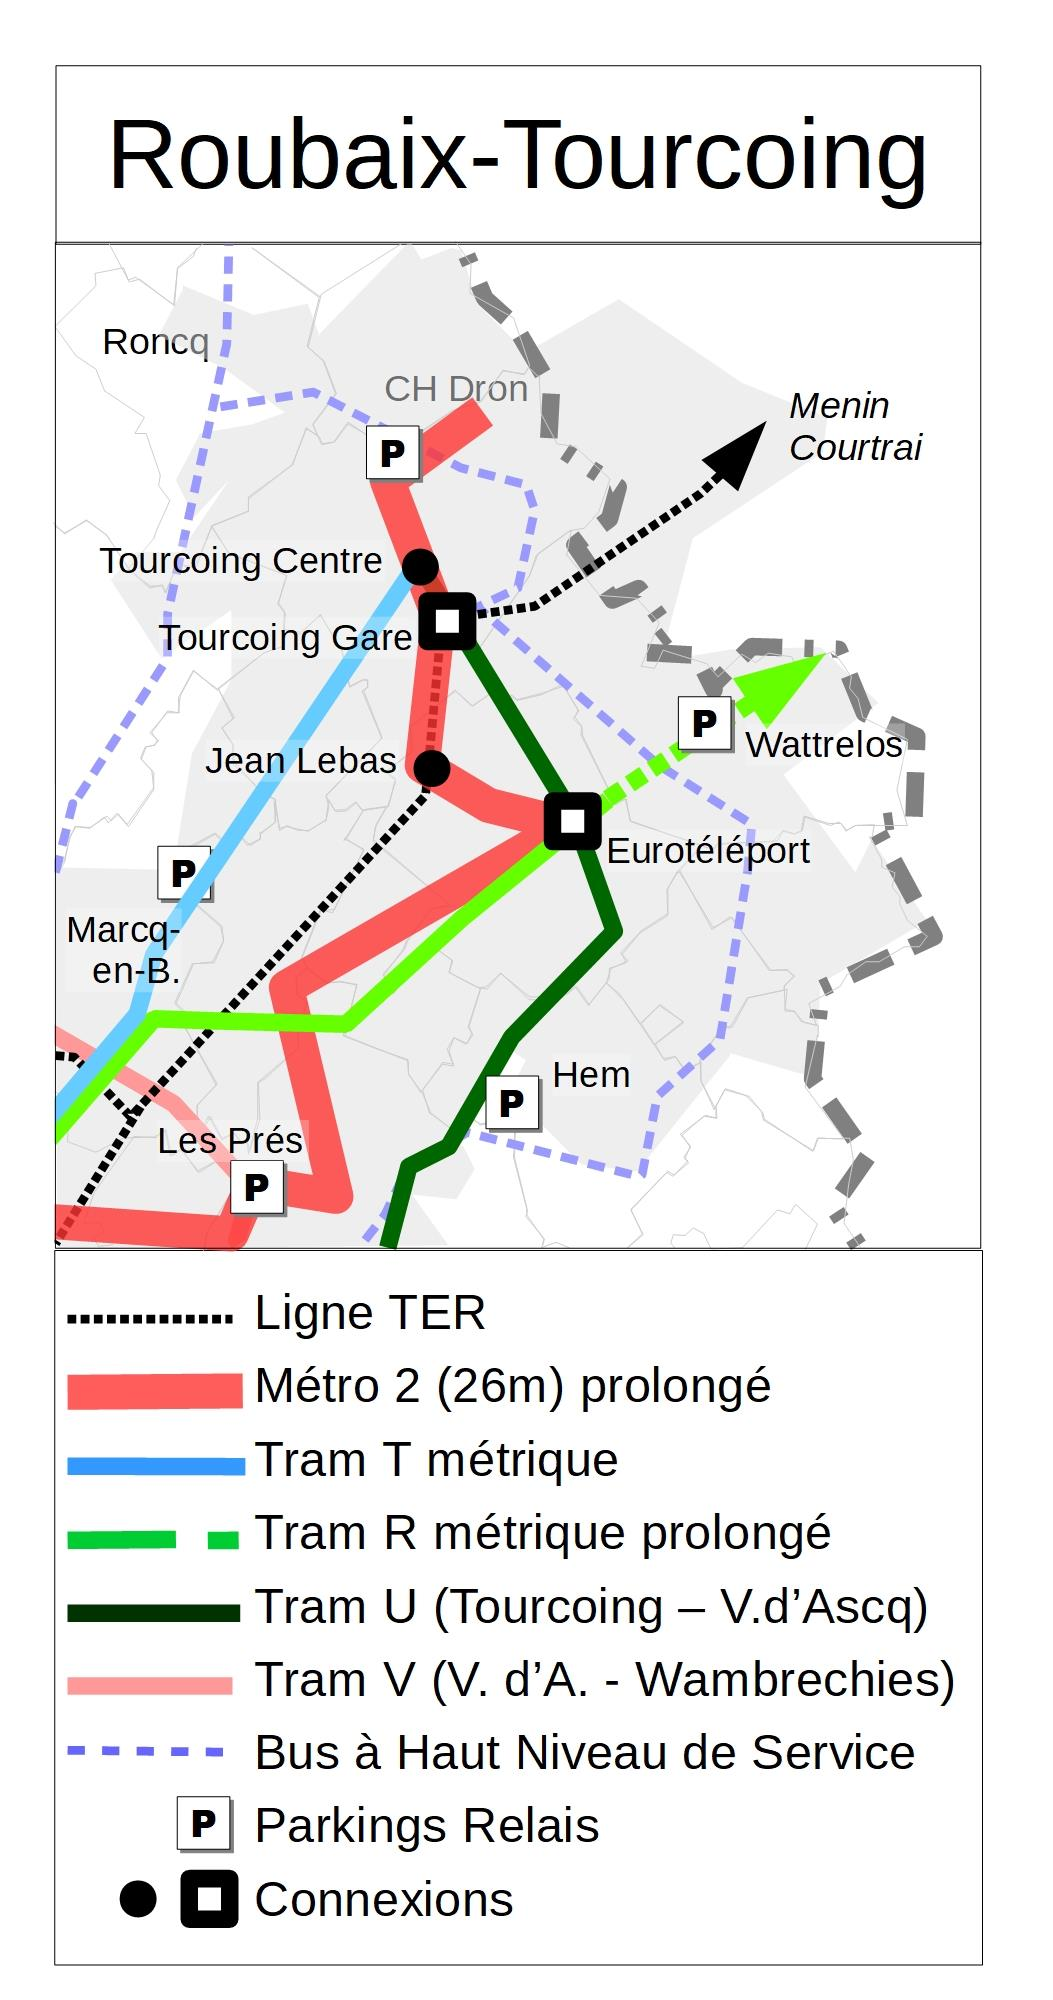 propositions_SDIT_EELV_Roubaix-Tourcoing